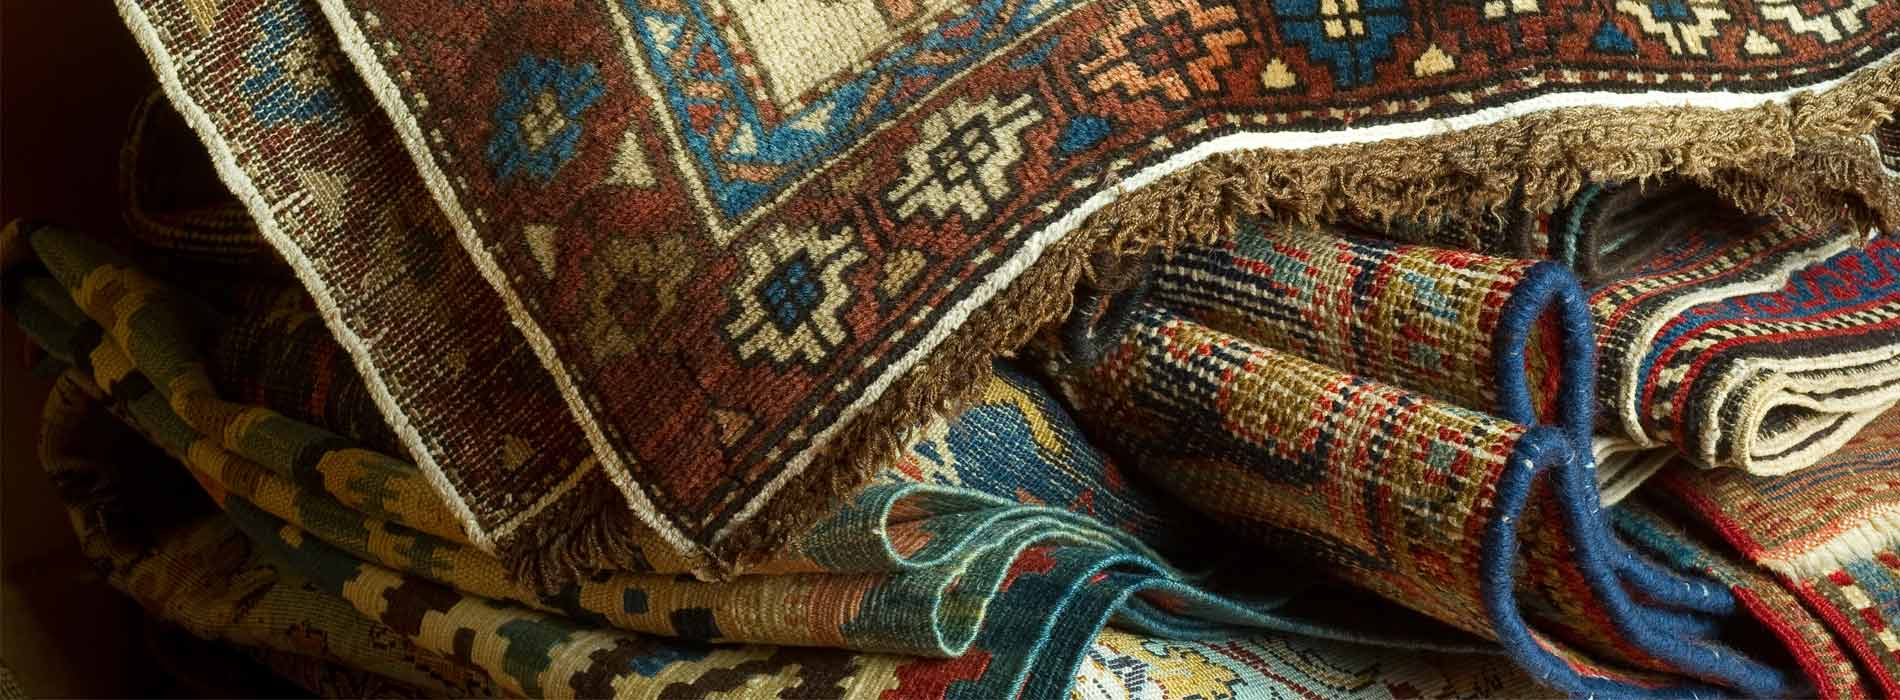 teppich reinigung berlin finest berlin with teppich. Black Bedroom Furniture Sets. Home Design Ideas